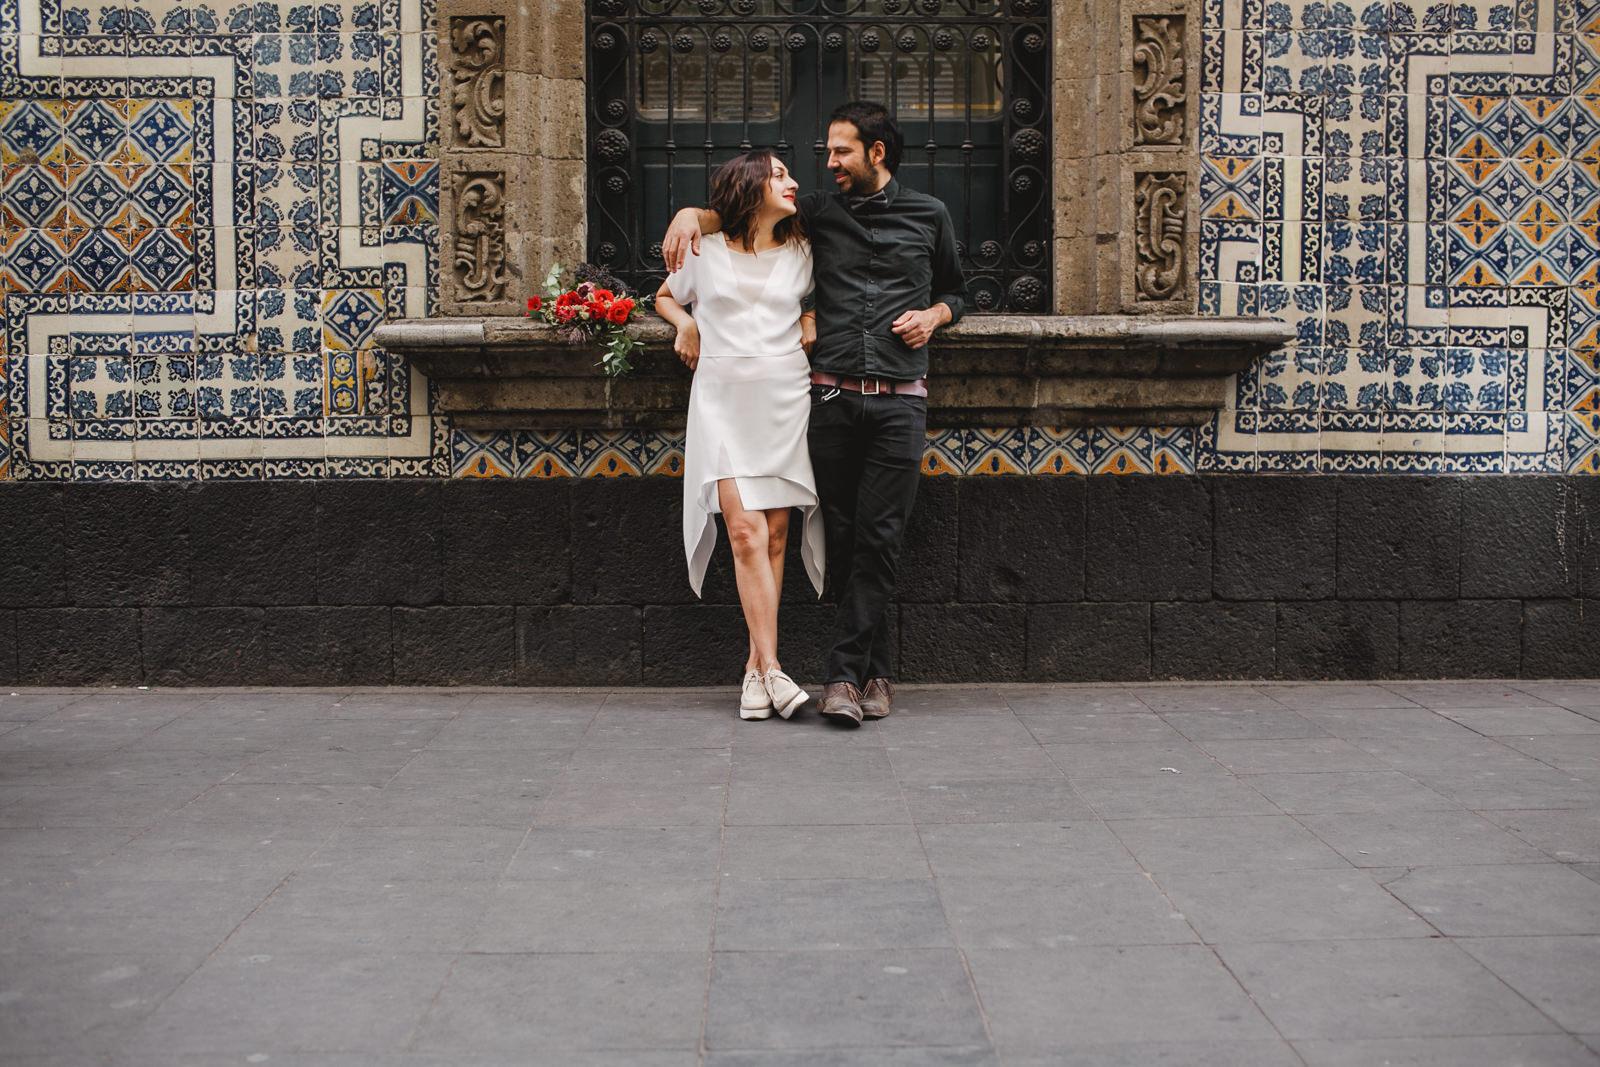 boda-en-cdmx-armando-aragon-033